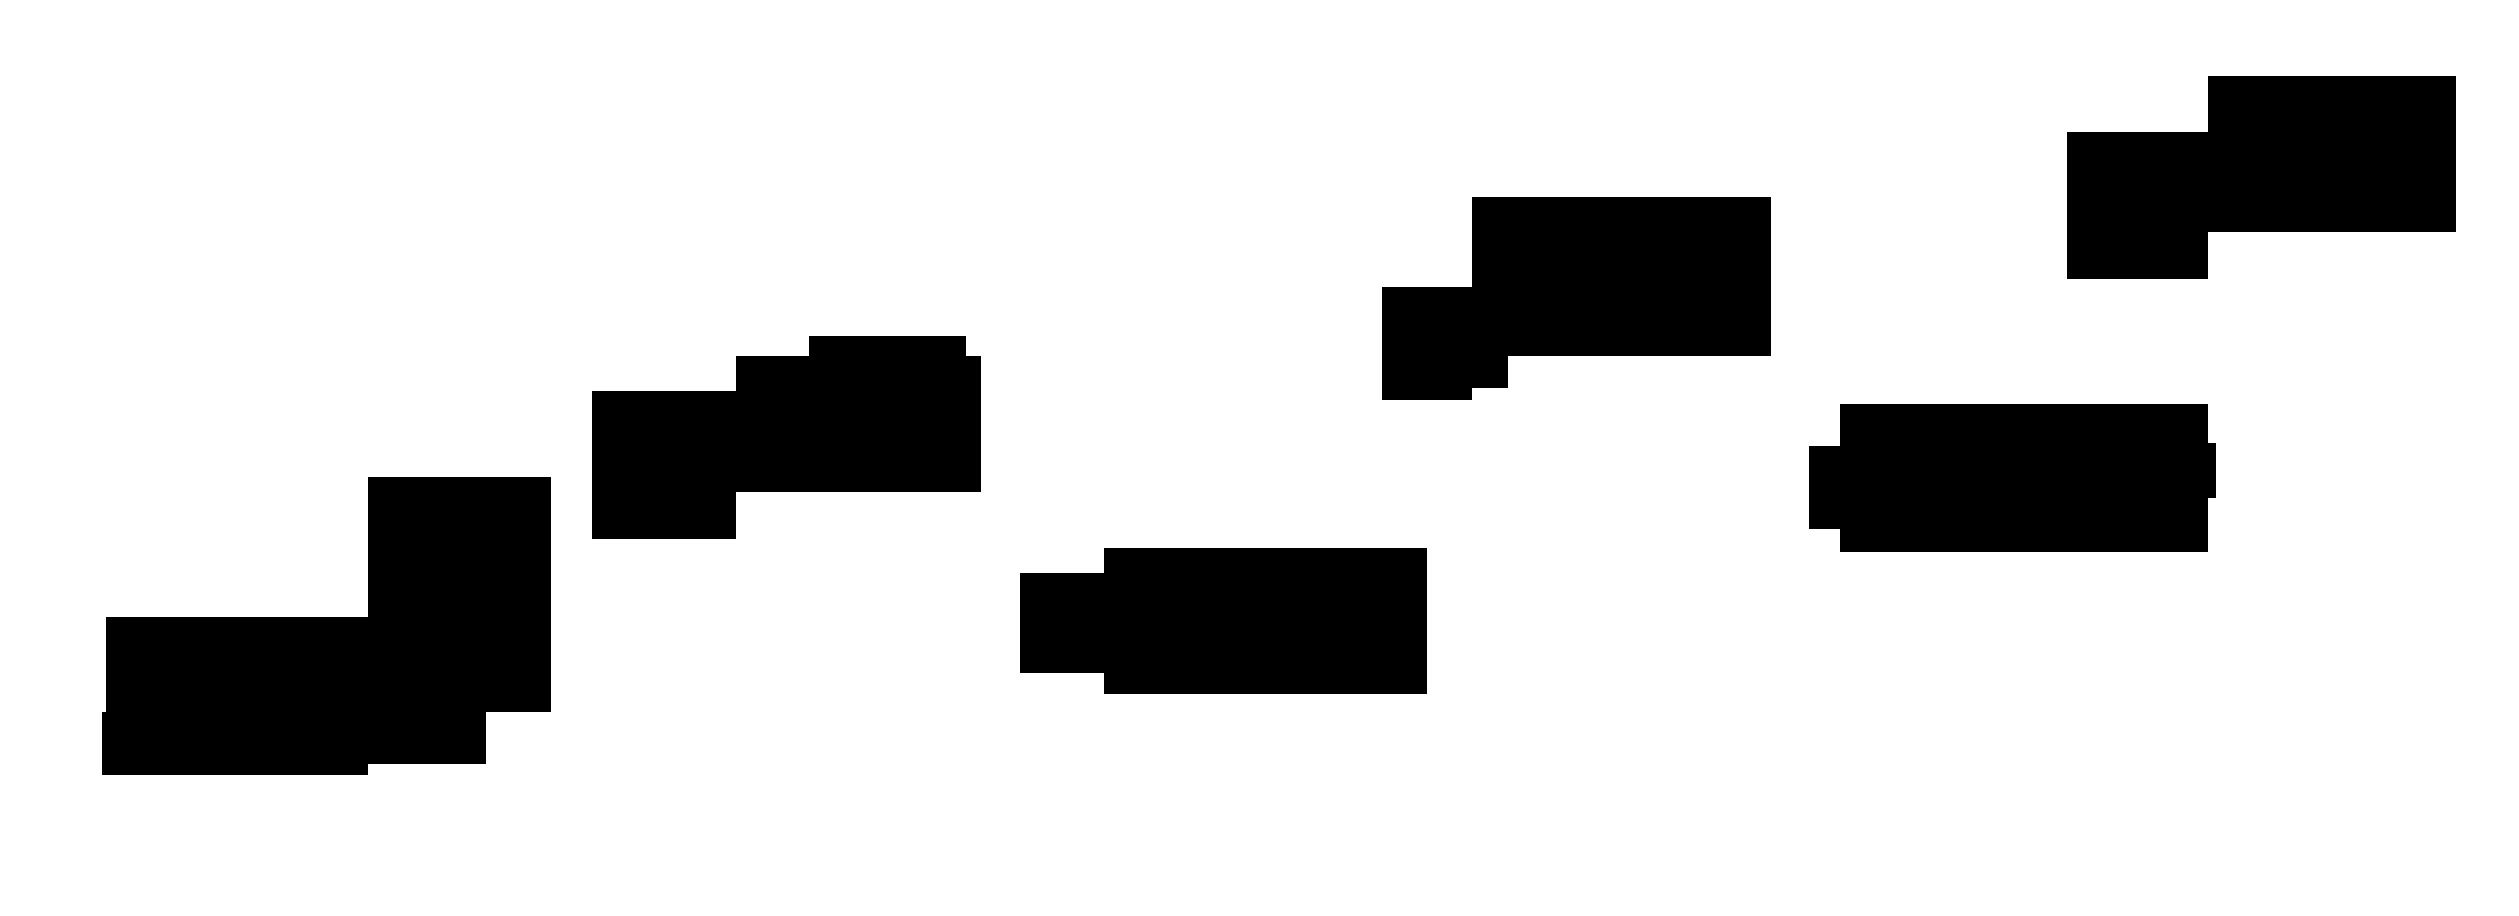 PNG Footprint - 154340